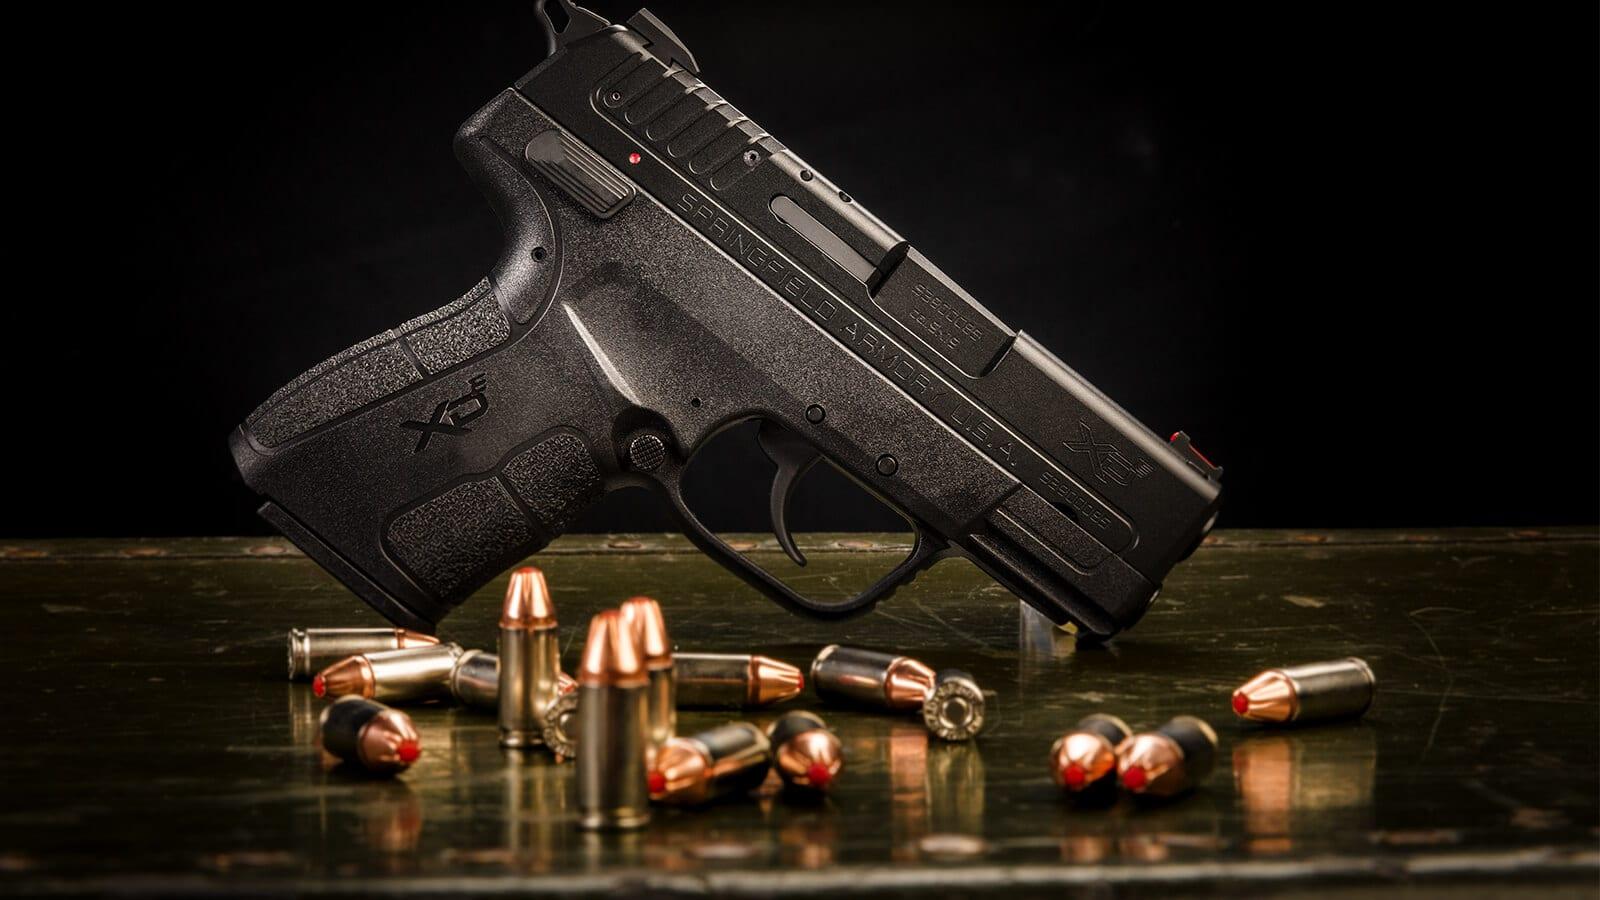 Springfield XD-E with 9mm Hornady ammunition on table